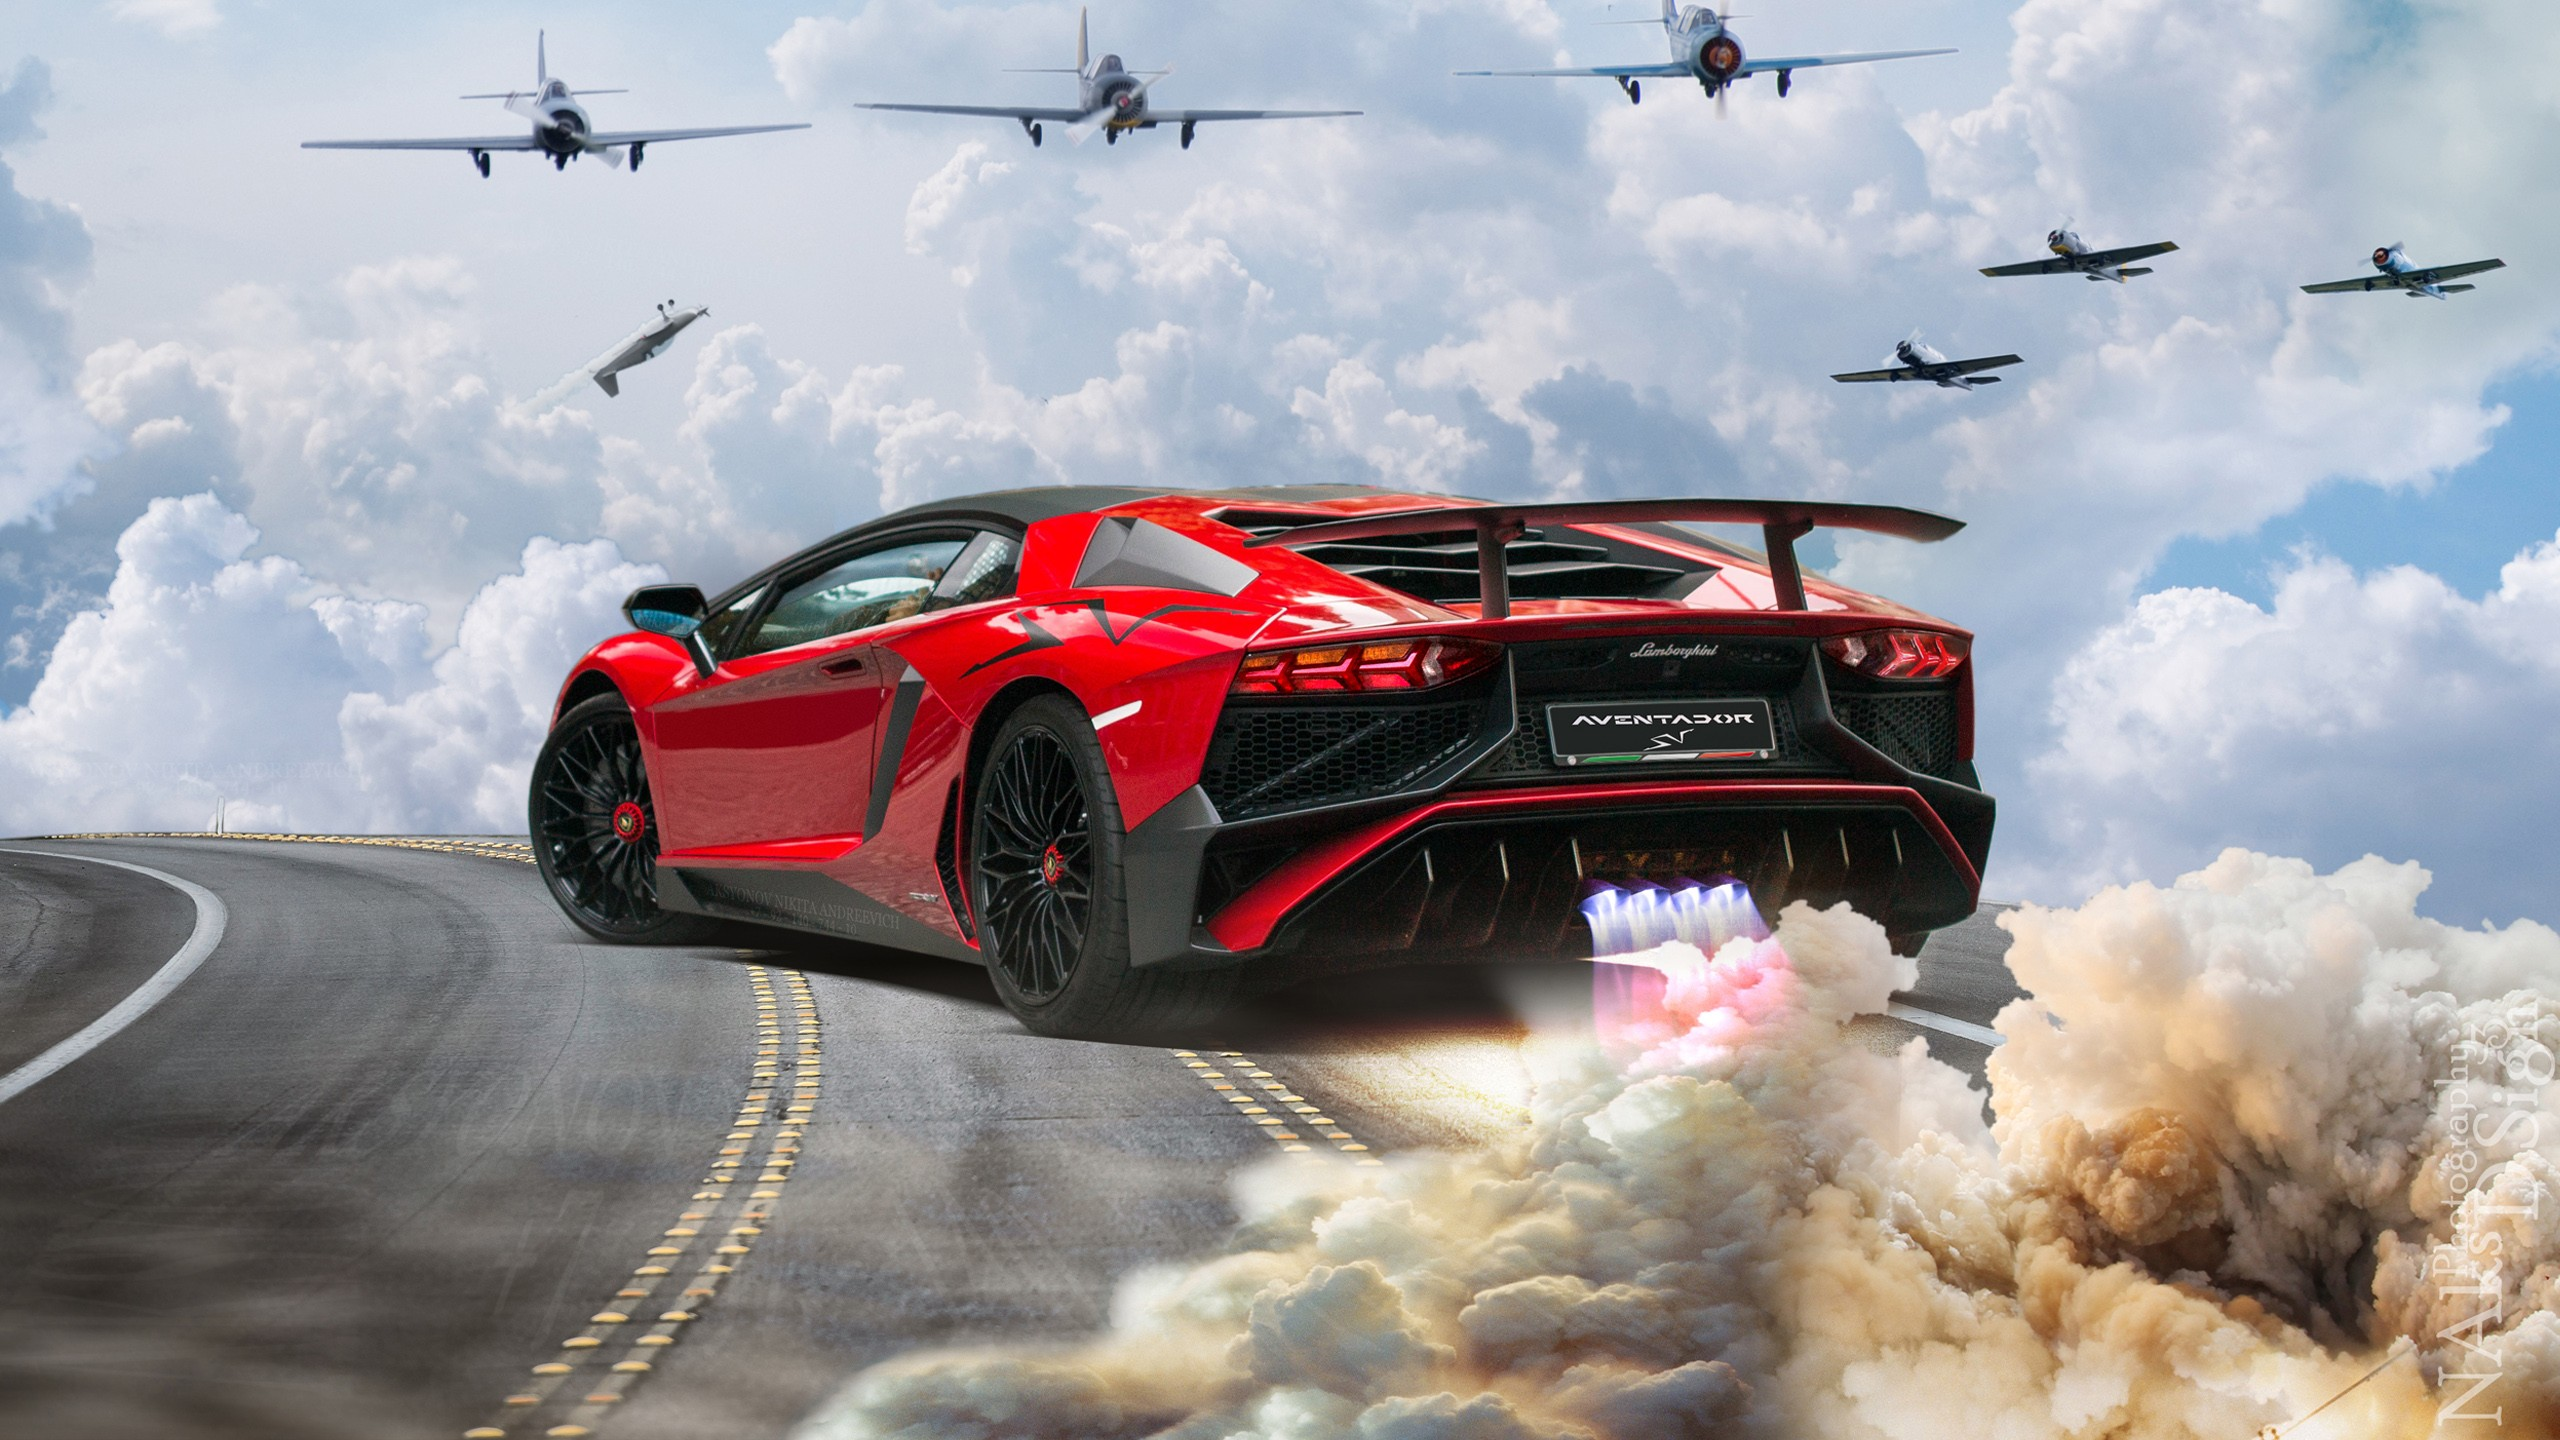 Lamborghini Aventador LP 750 4 Superveloce After Space ...